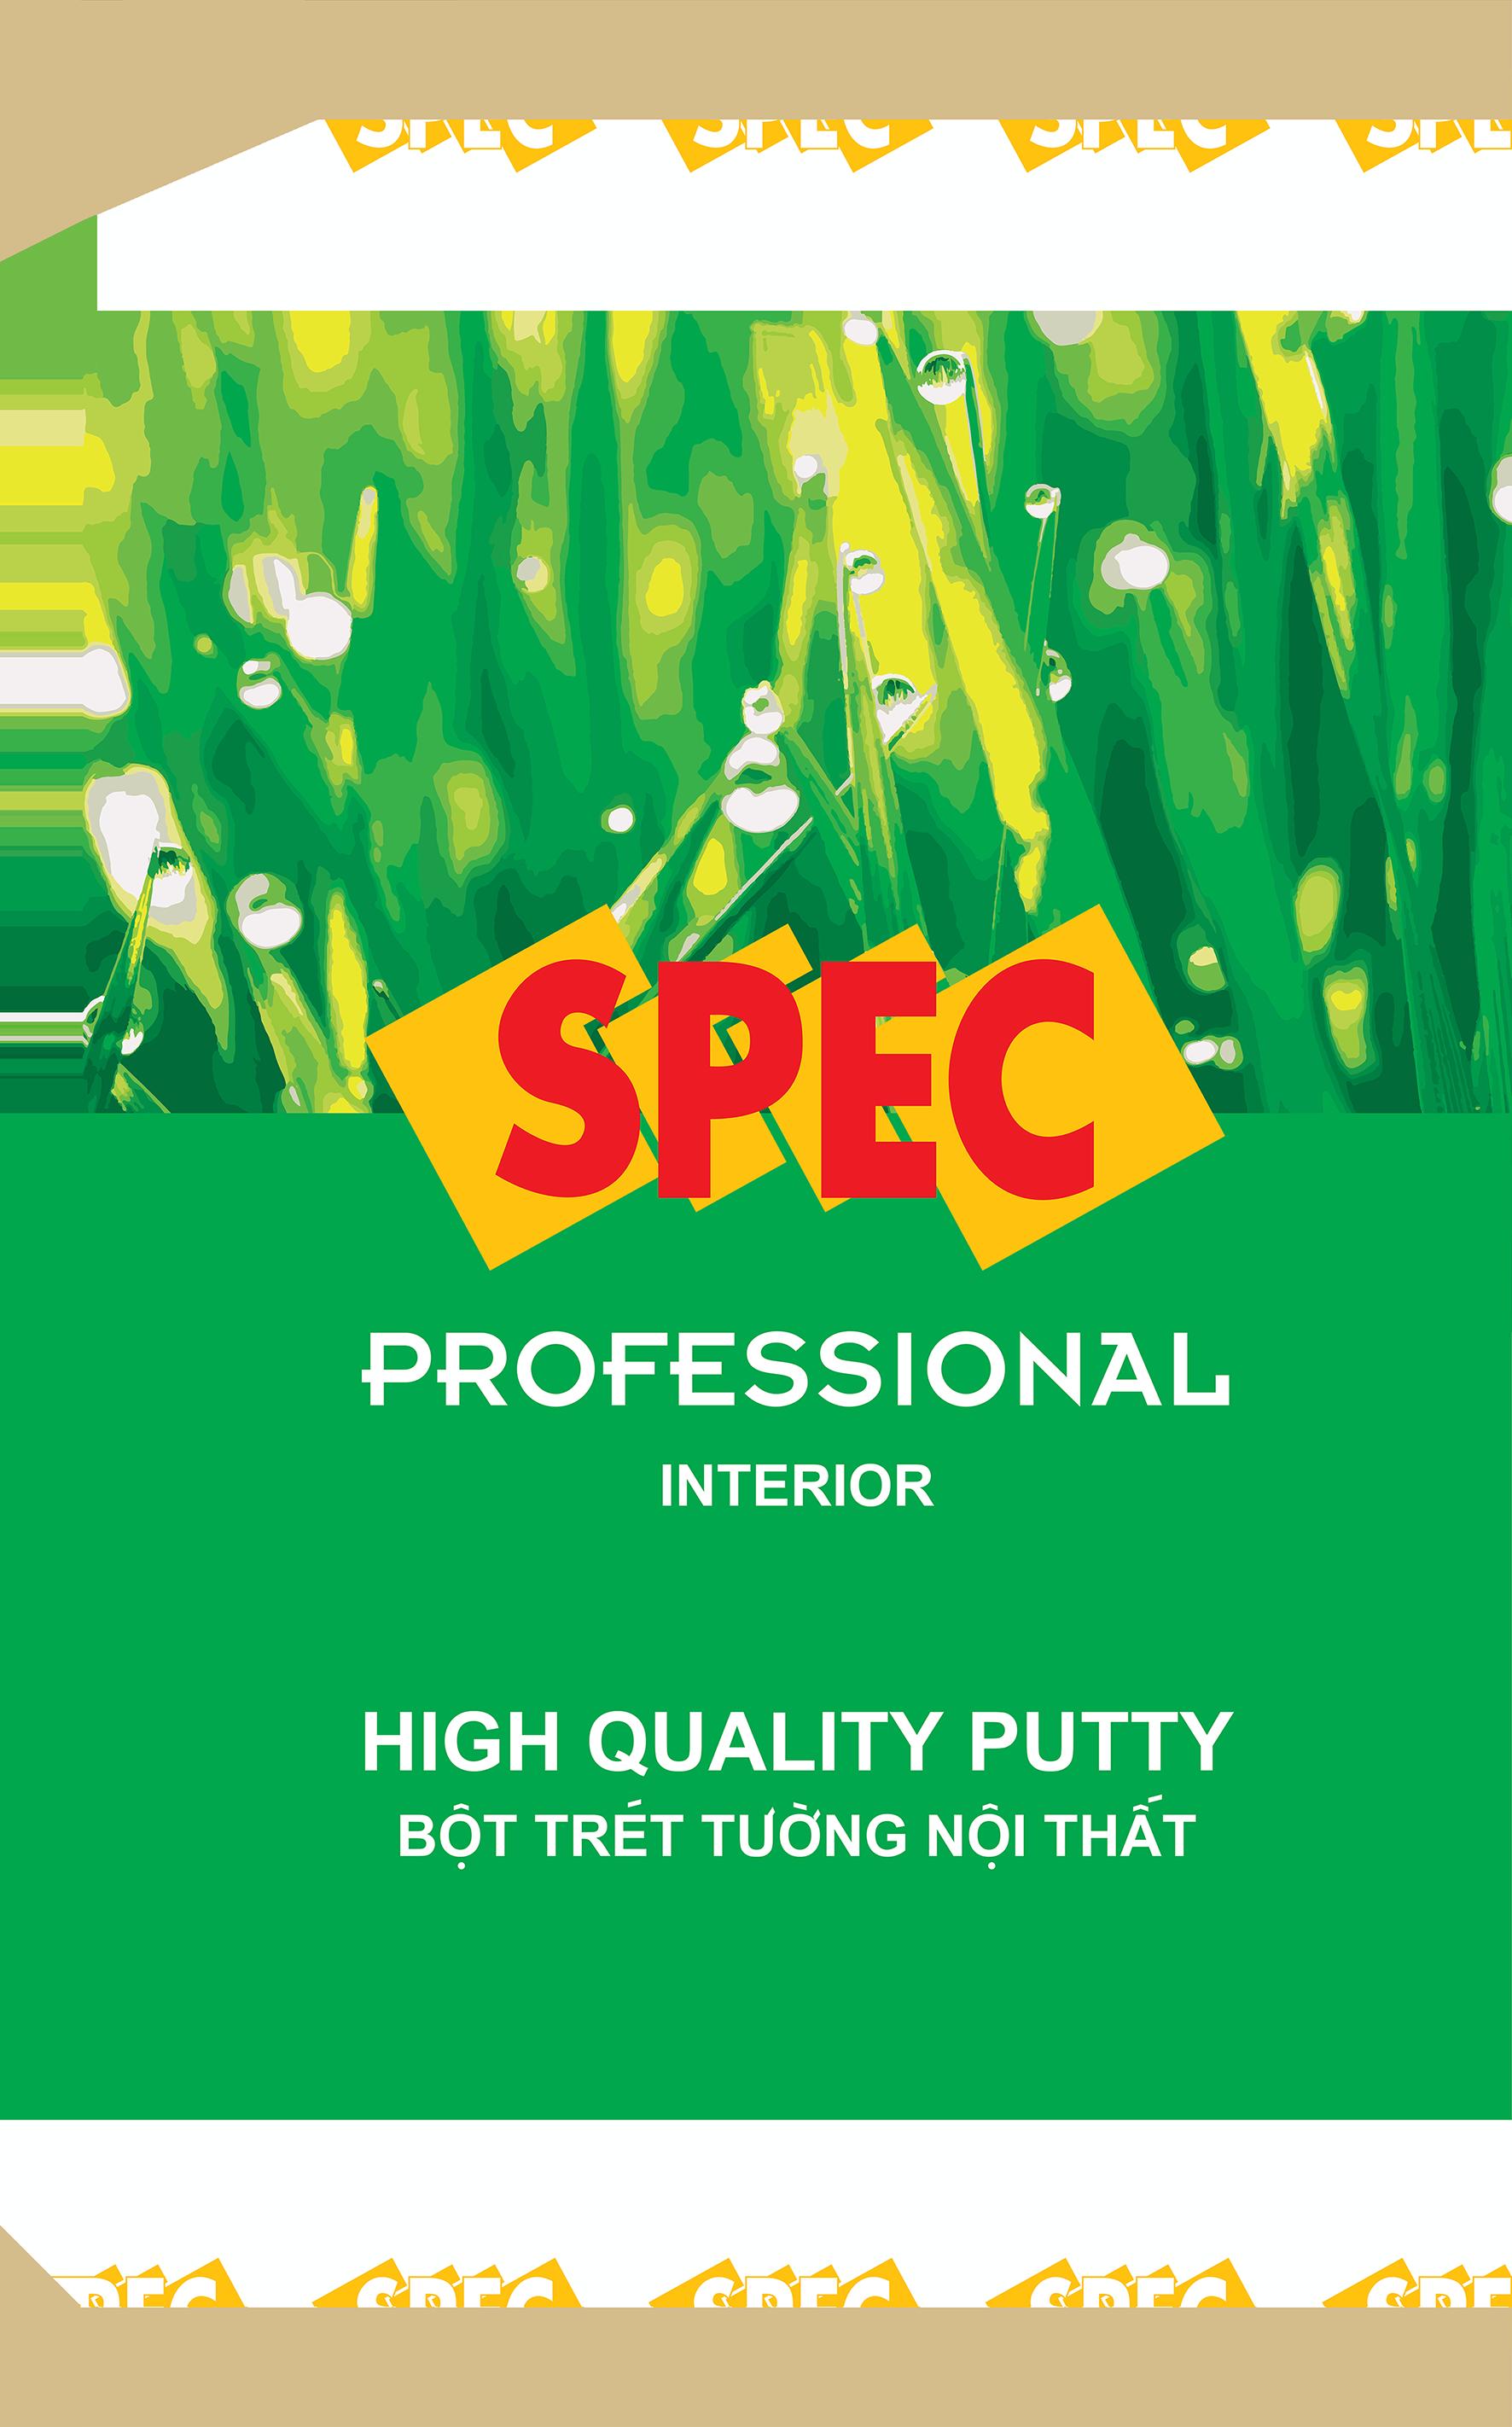 BOT TRET SPEC PROFESSIONAL PUTTY INT